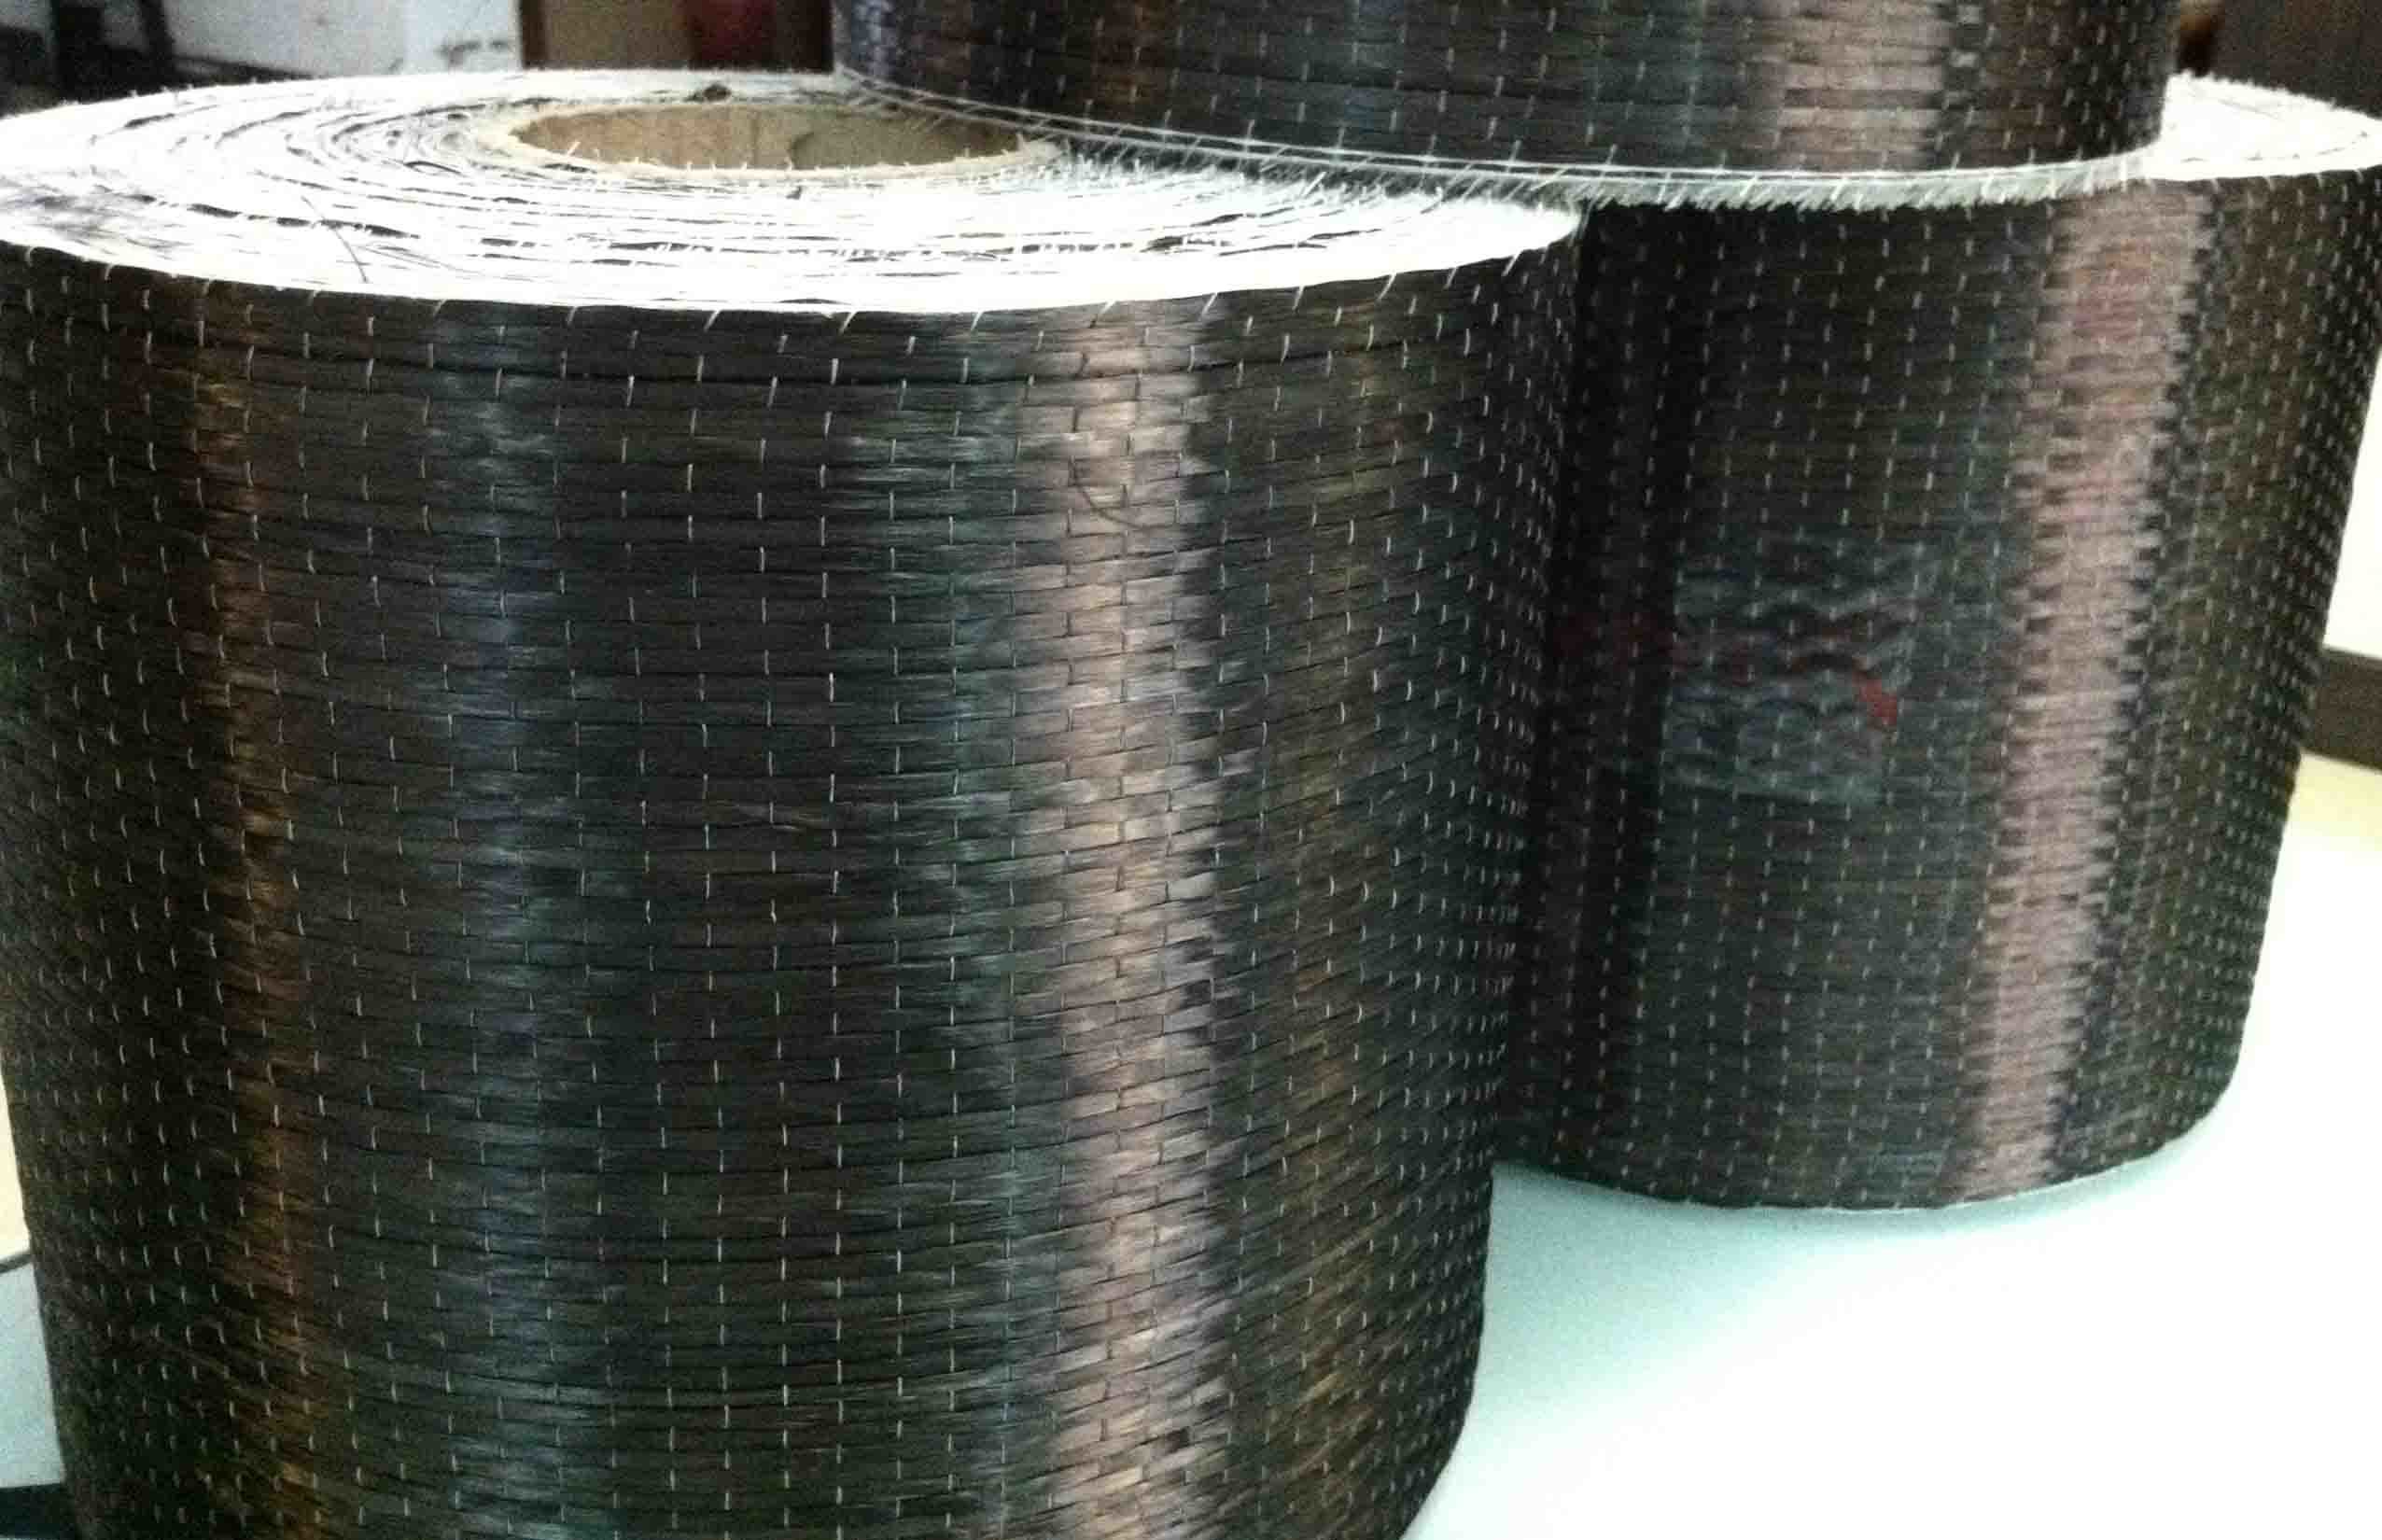 Bai Sheng Carbon Fiber Reinforced Cloth